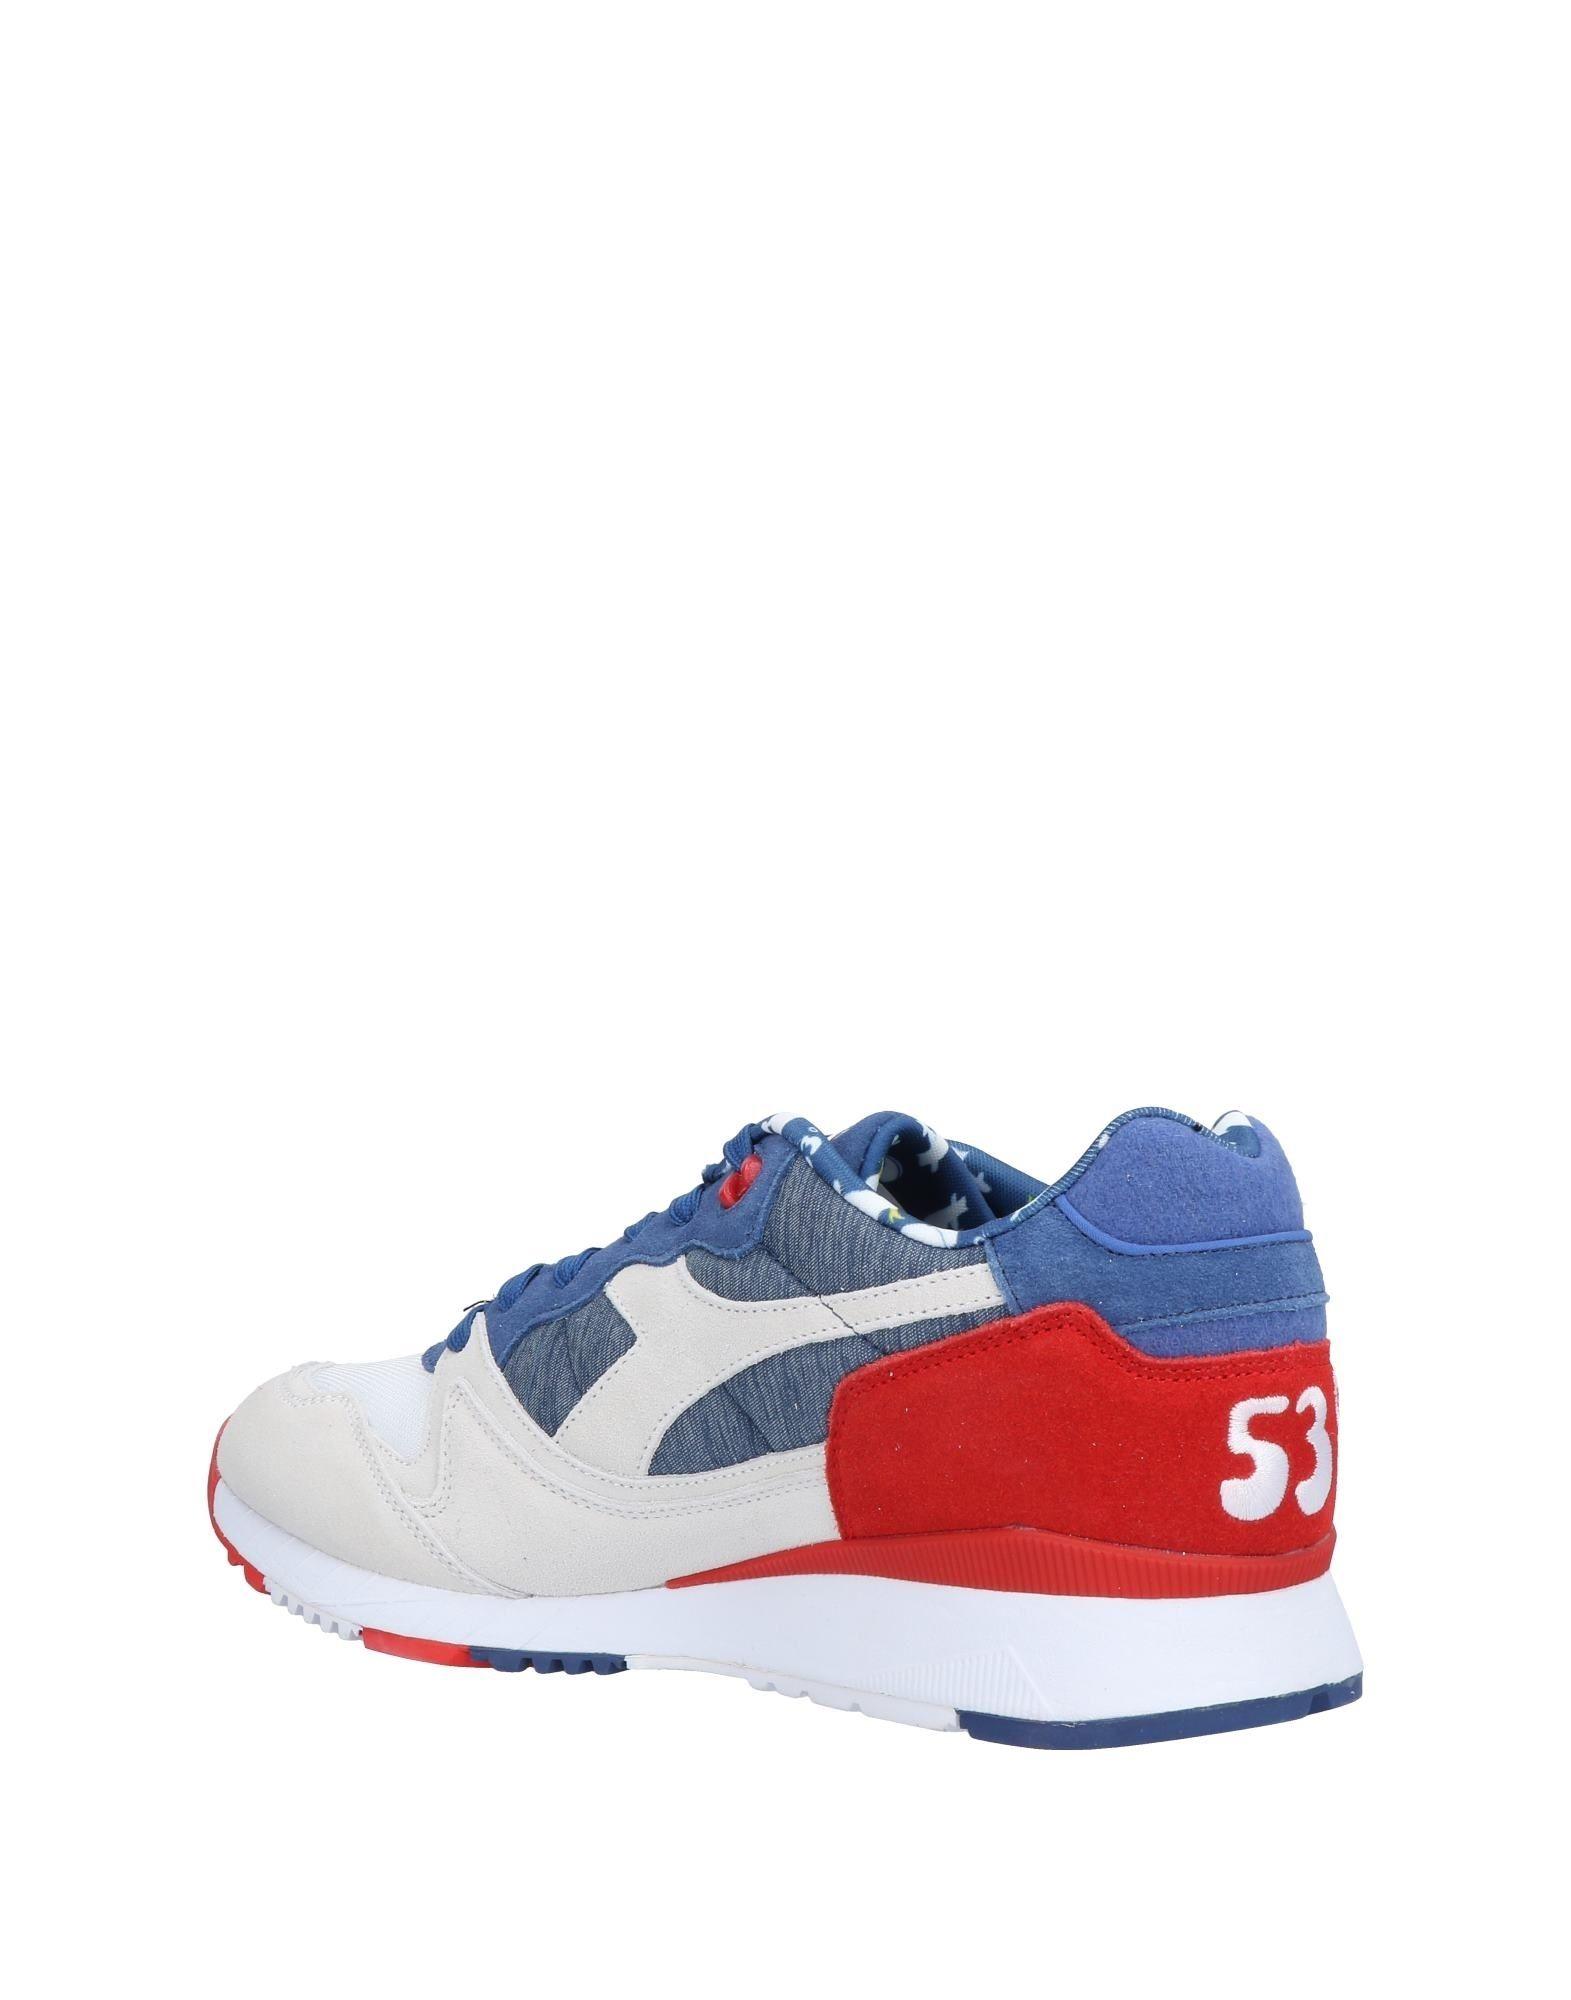 11429213WJ Diadora Sneakers Herren  11429213WJ  Heiße Schuhe afde69